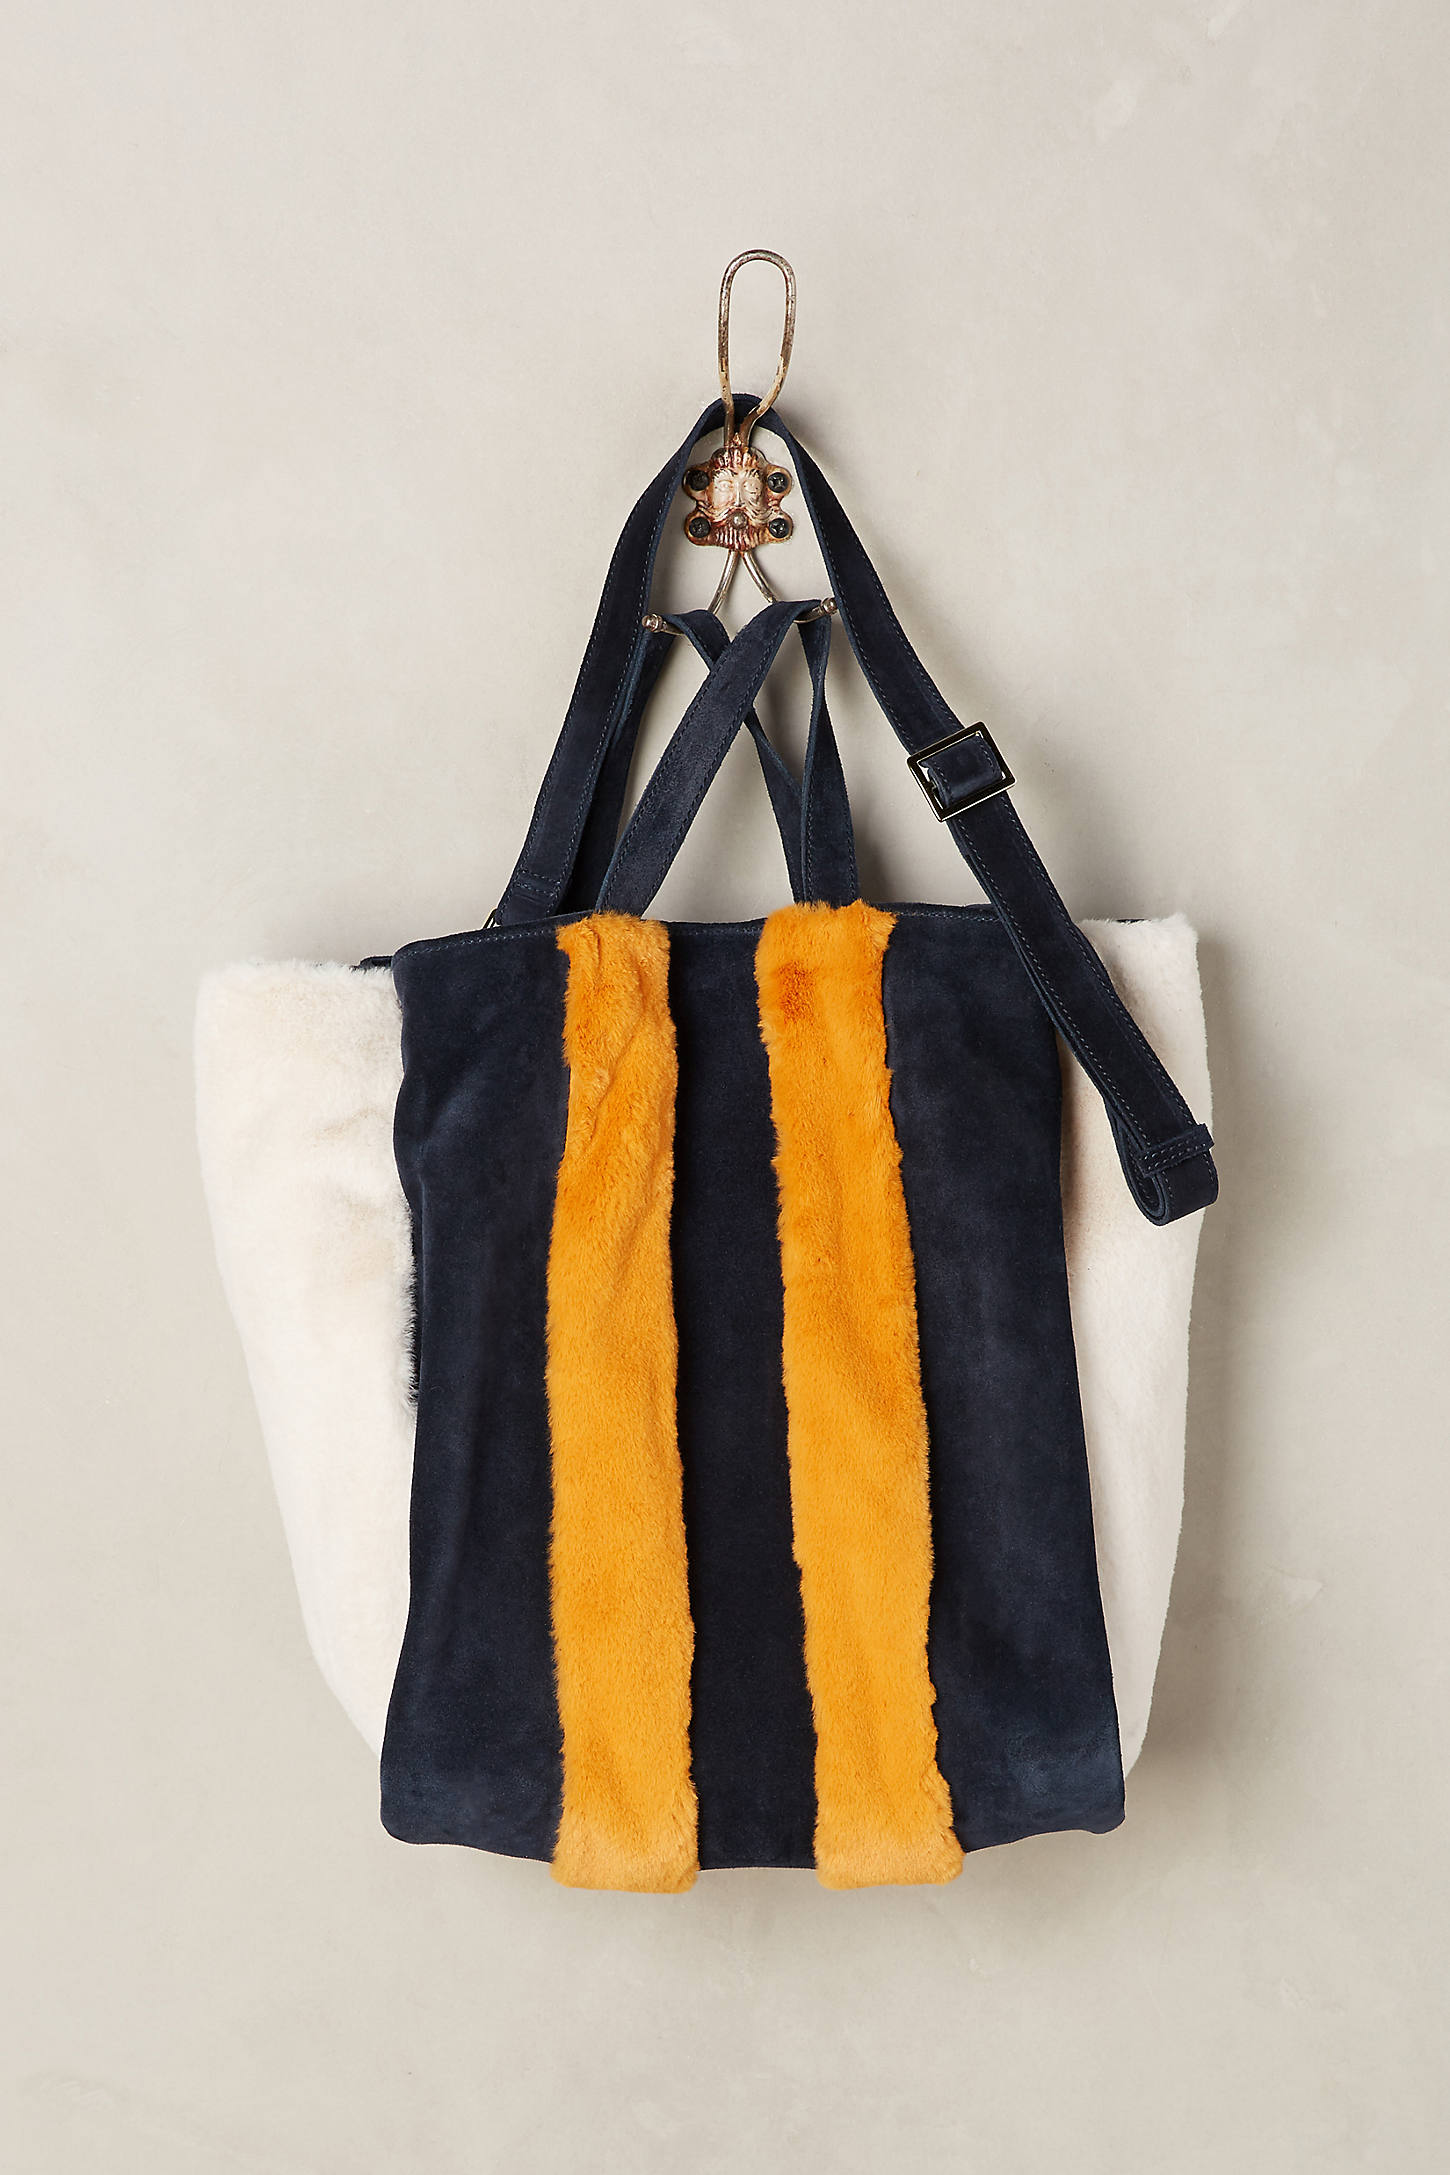 Sally Striped Tote Bag